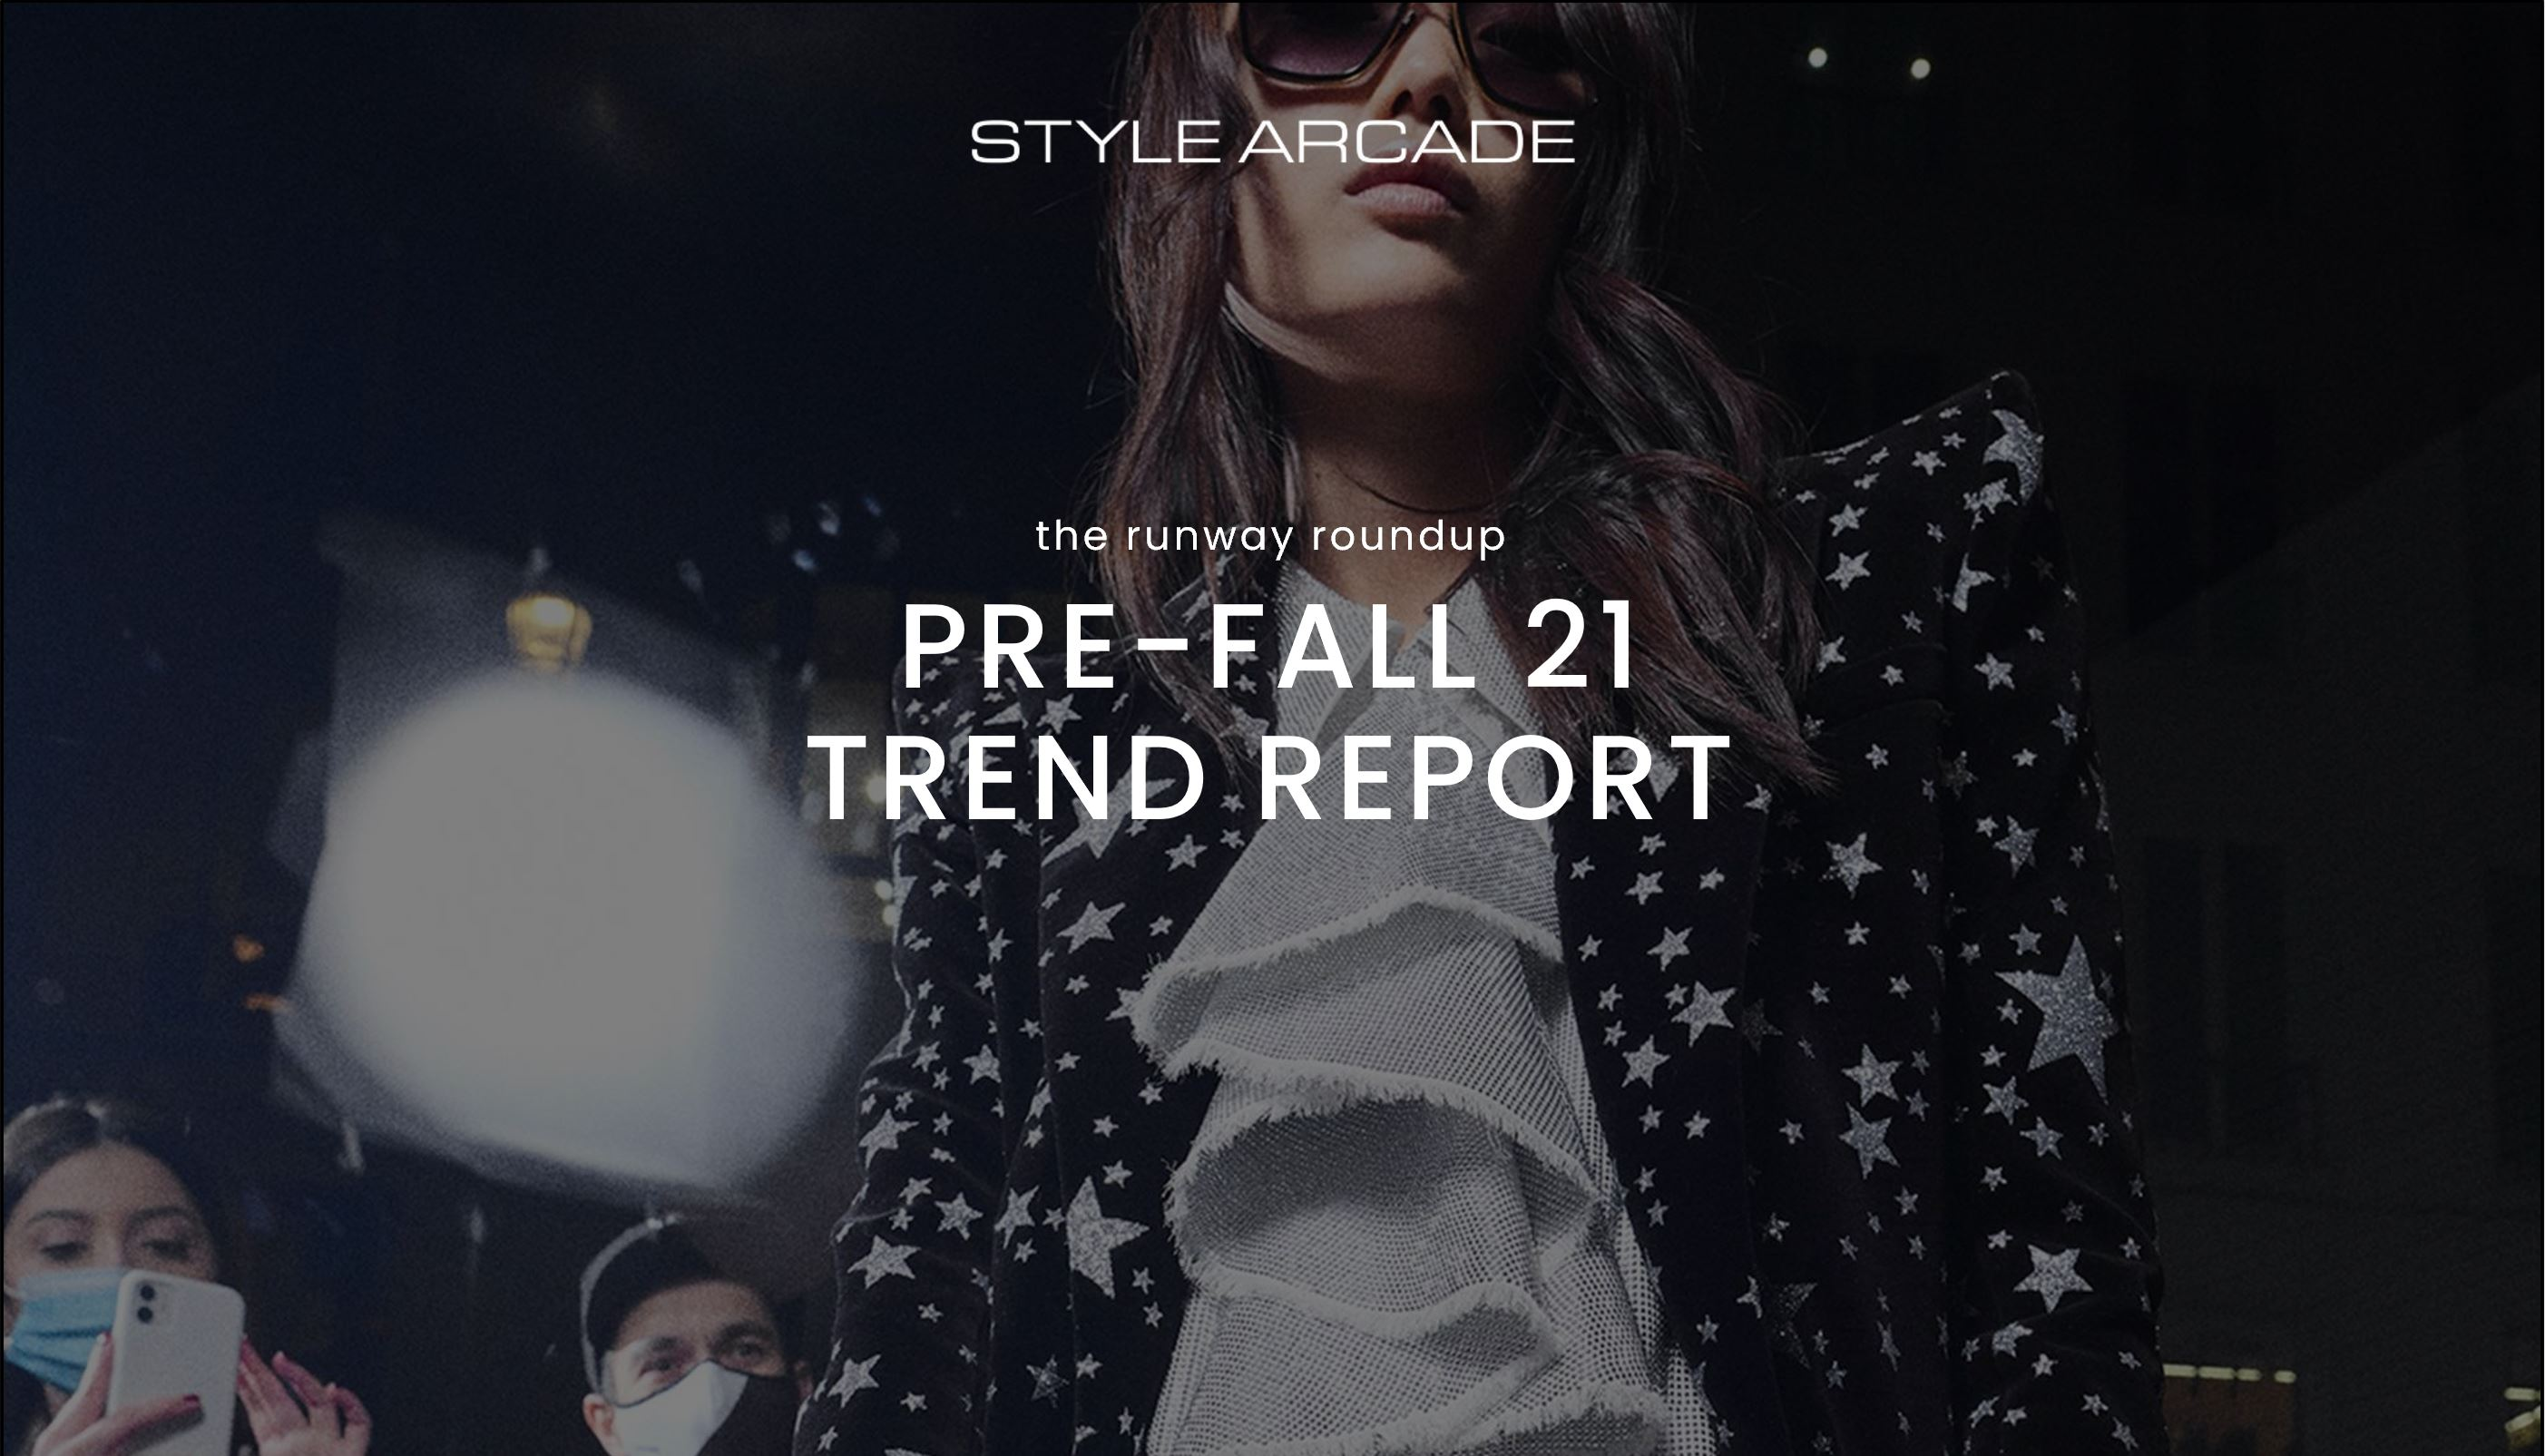 Pre-Fall 21 Trend Report